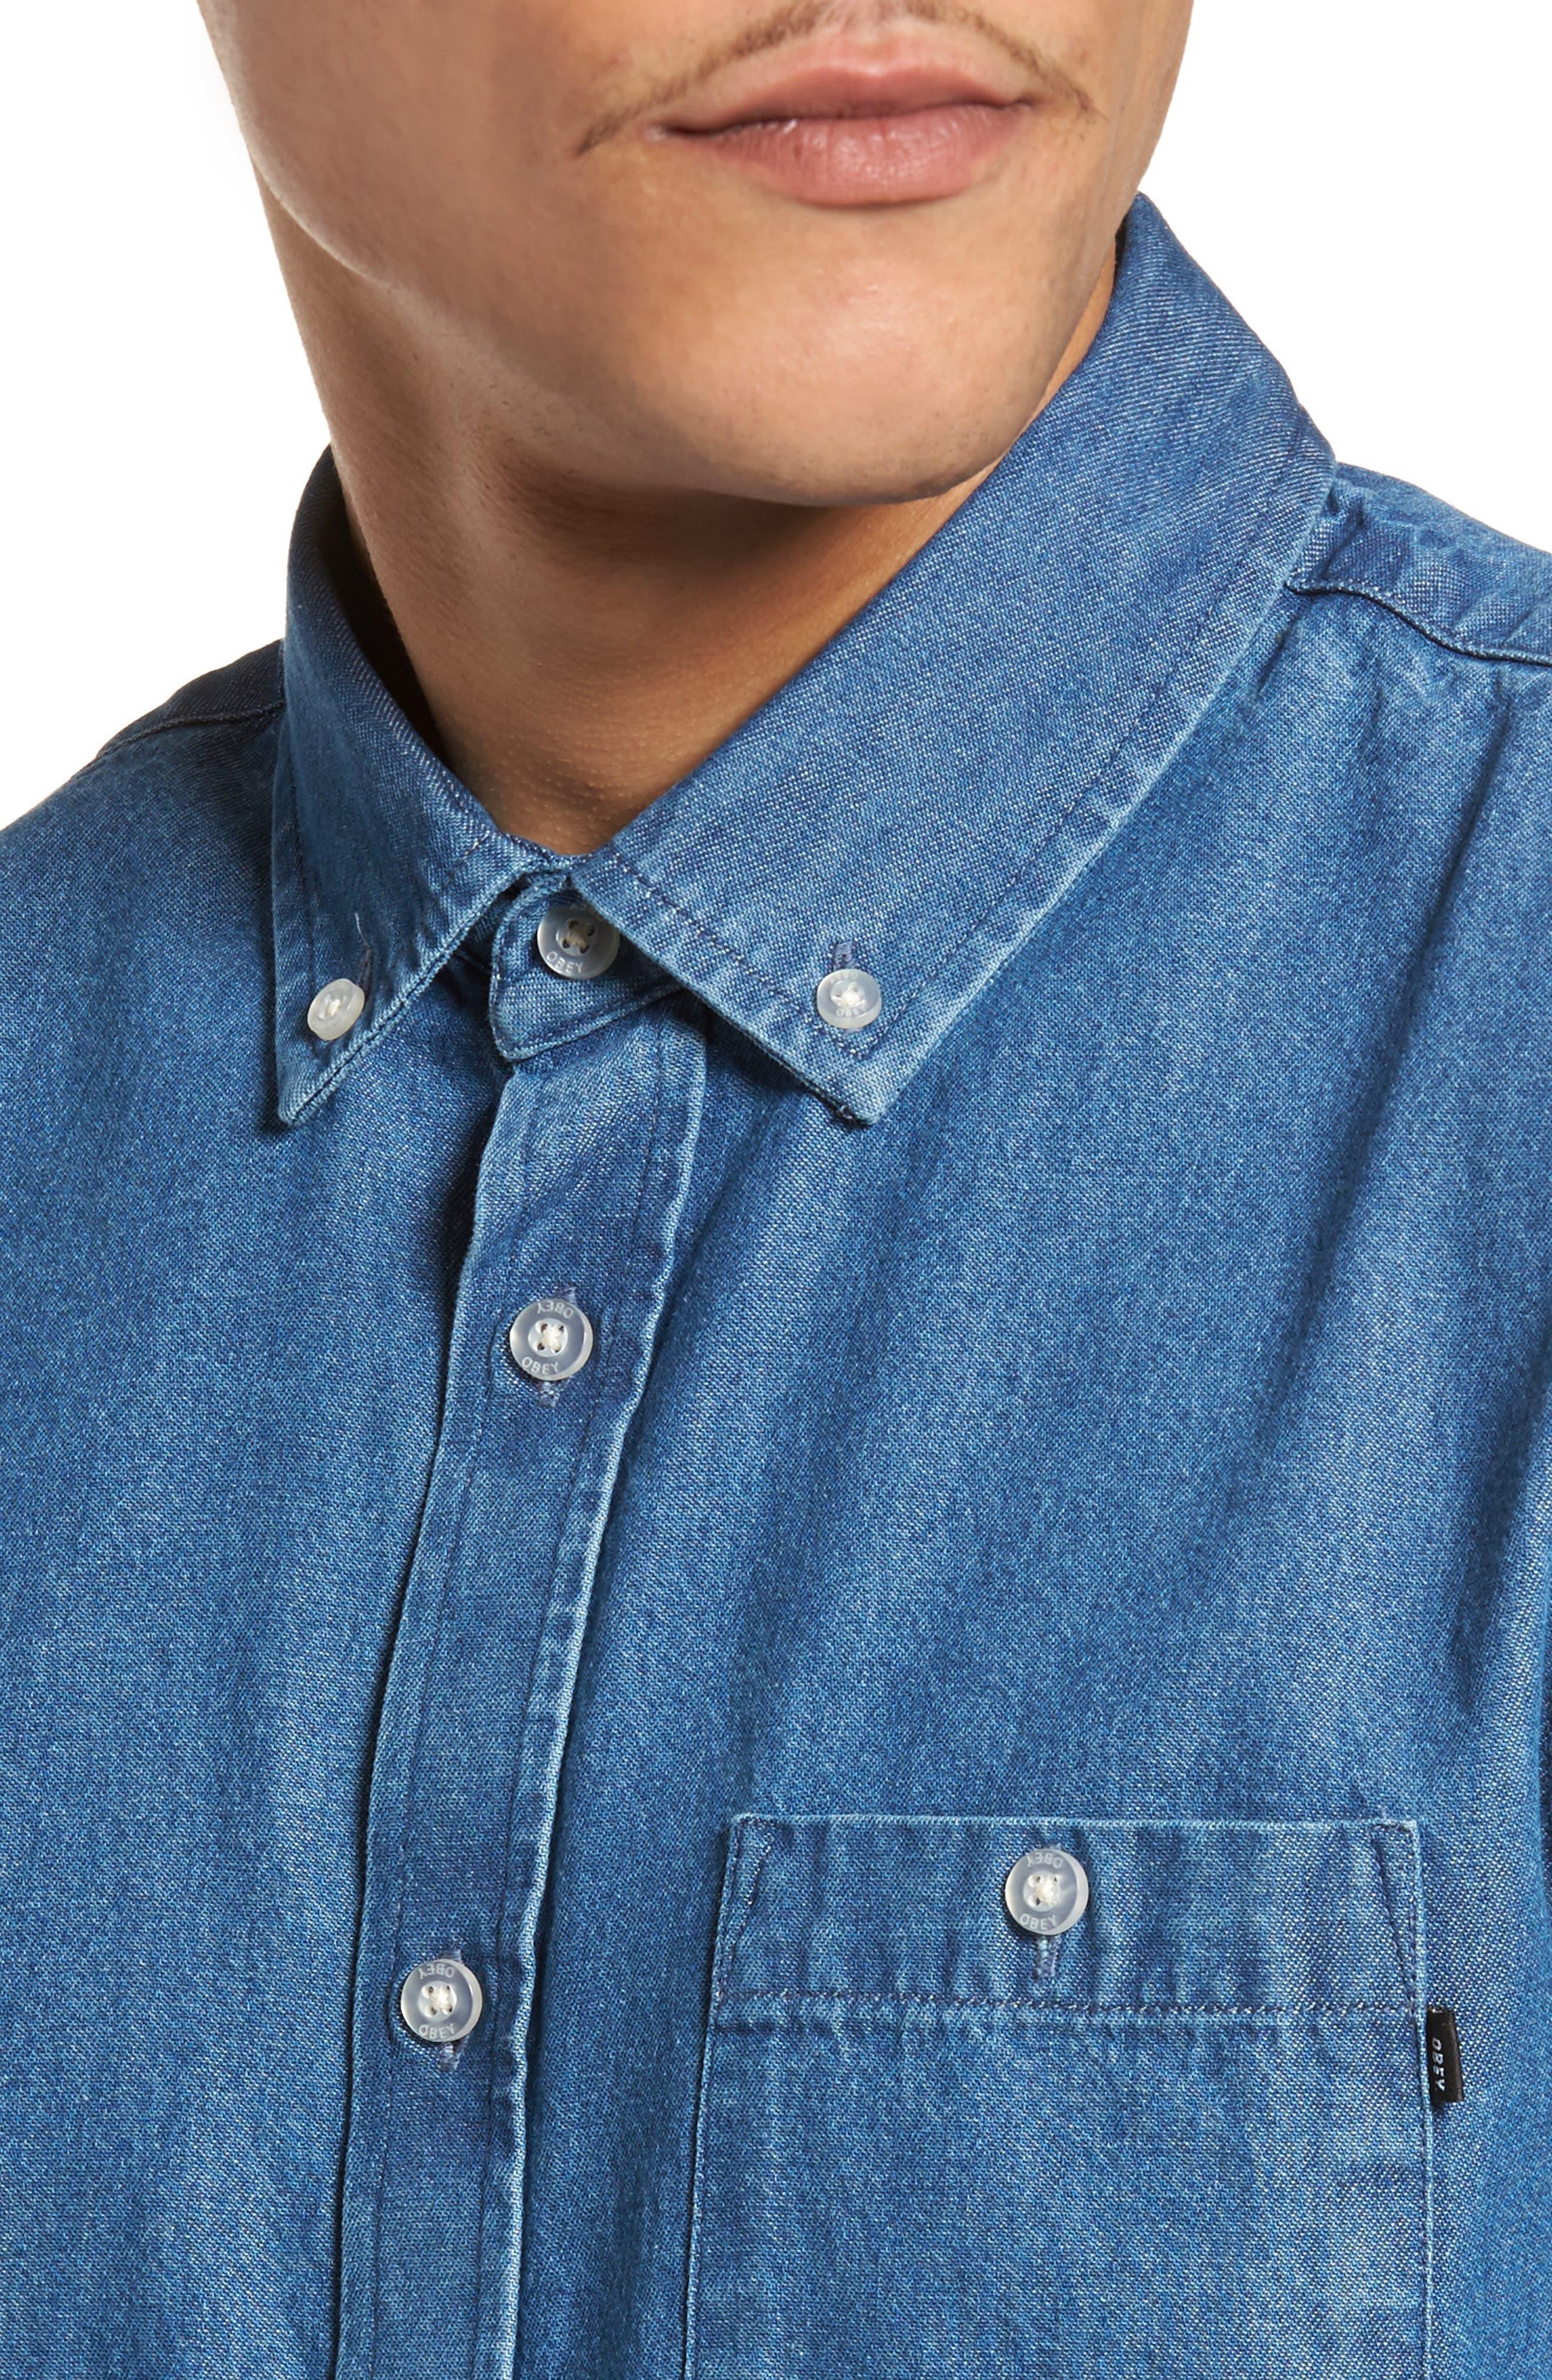 Kebble Denim Shirt,                             Alternate thumbnail 4, color,                             450